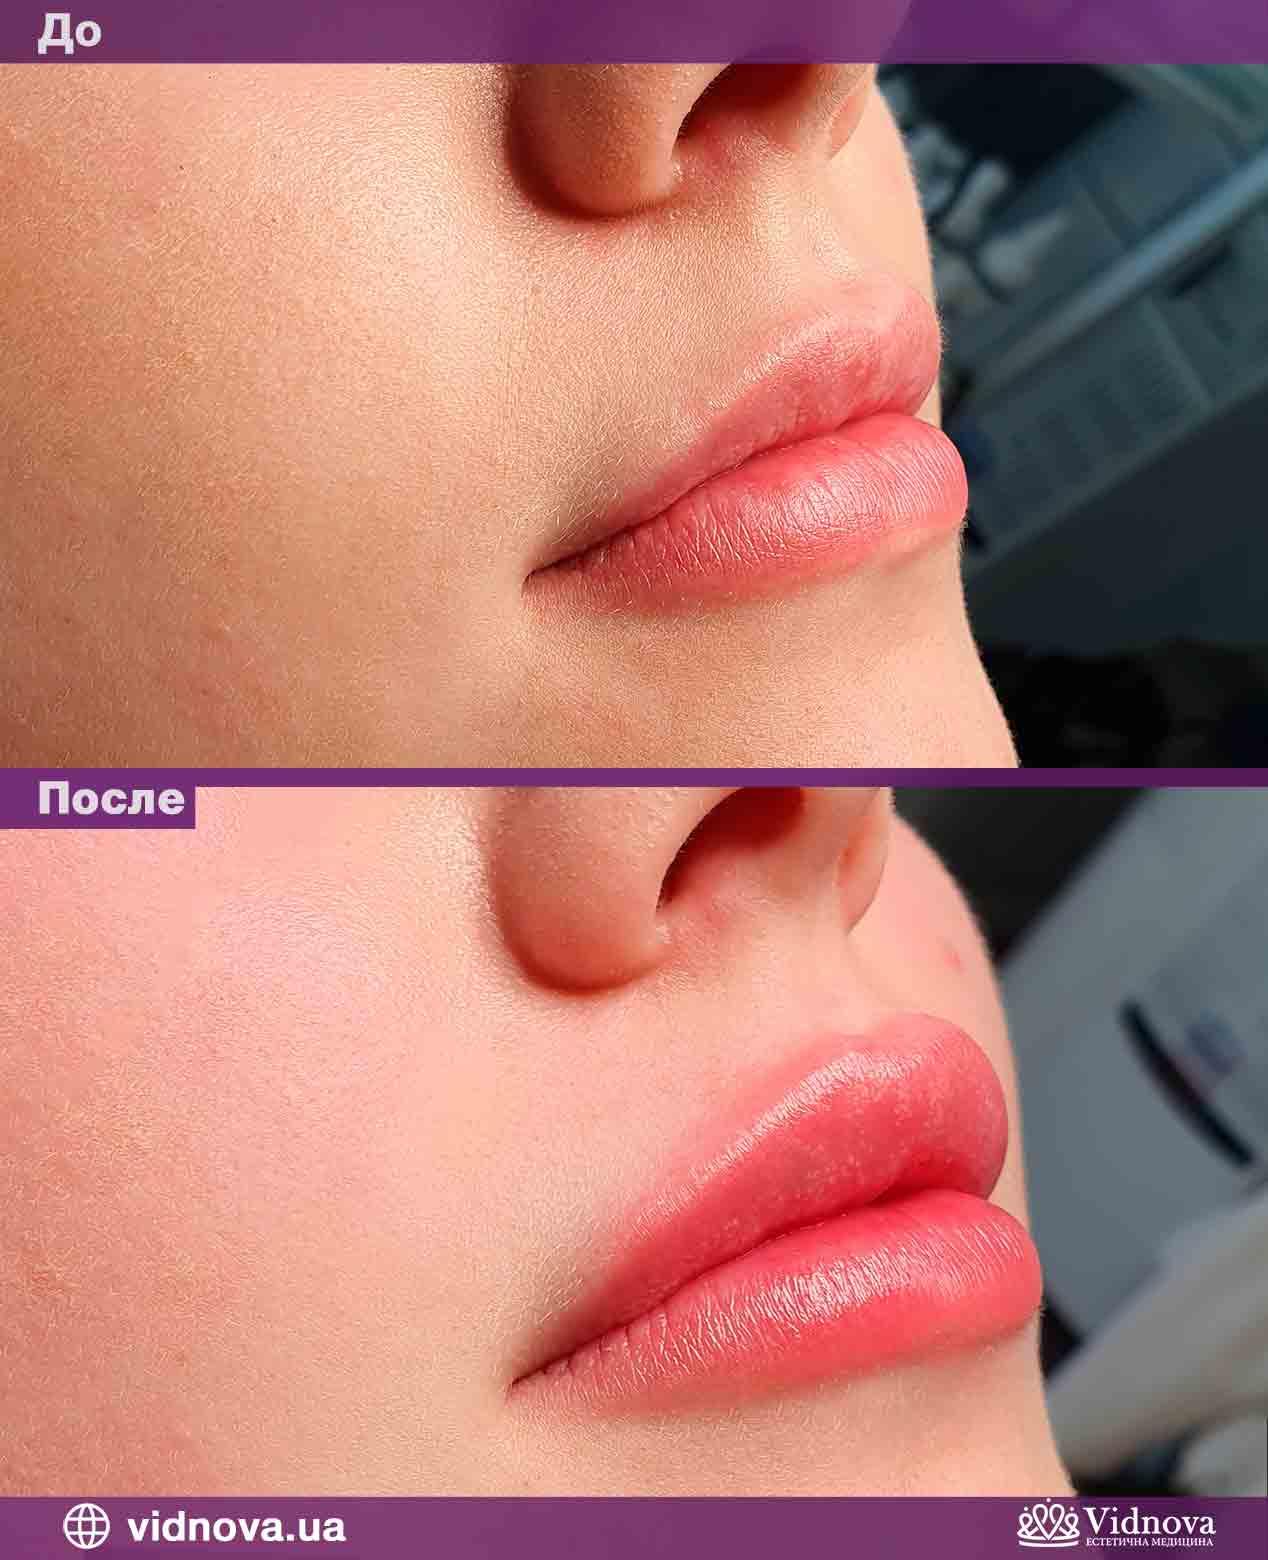 Увеличение губ: Фото До и После - Пример №5-1 - Клиника Vidnova